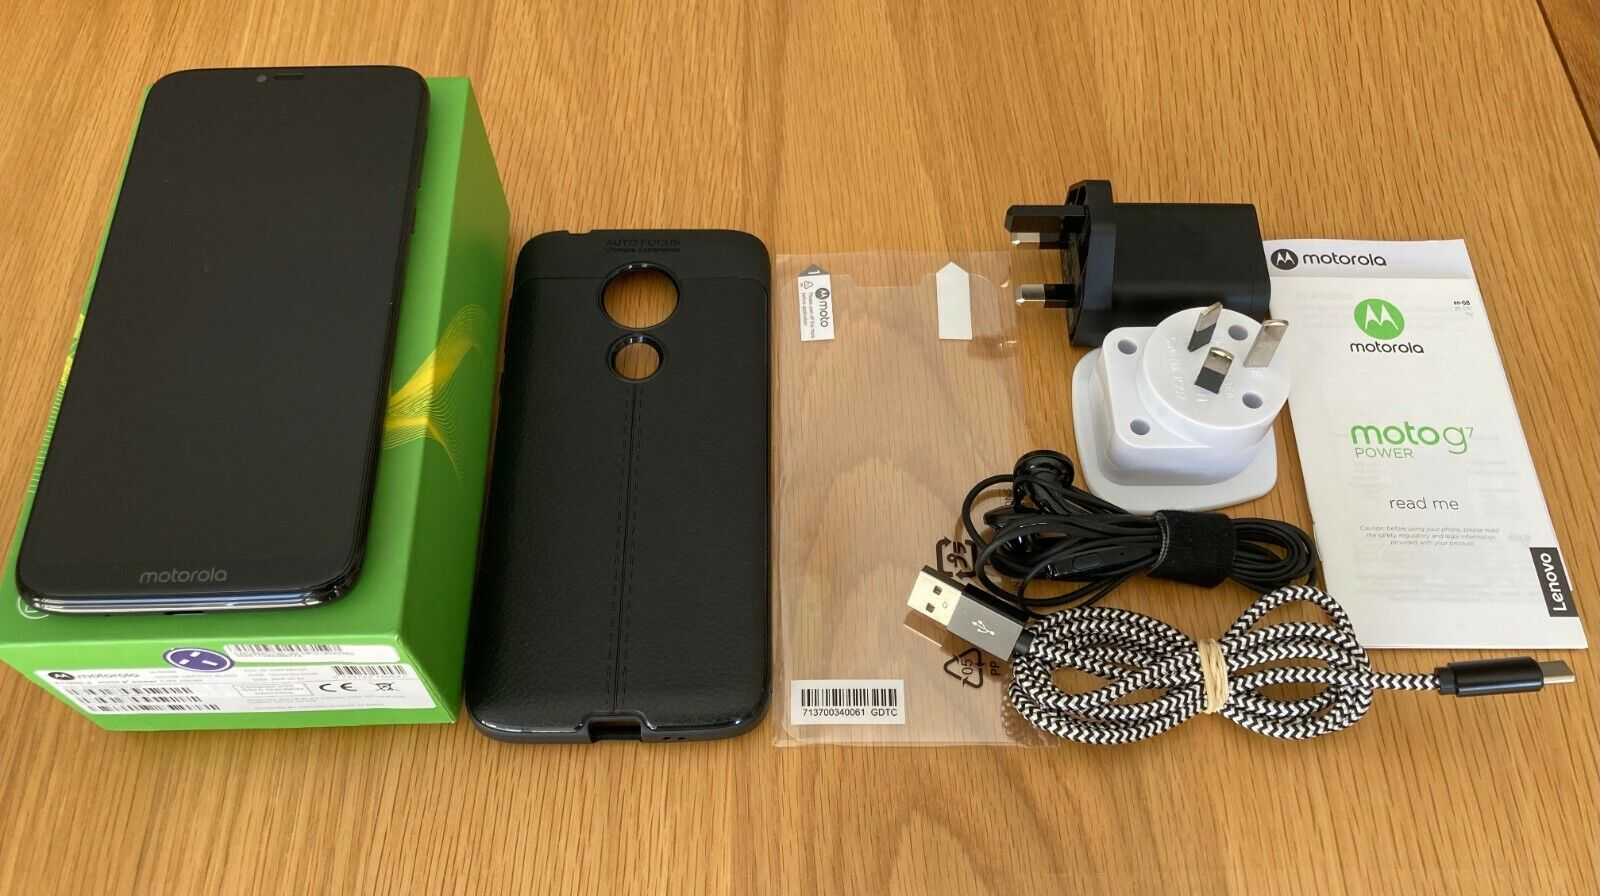 Android Phone - Moto G7 Power XT1955-4 64GB Dual SIM Ceramic Black (Unlocked)